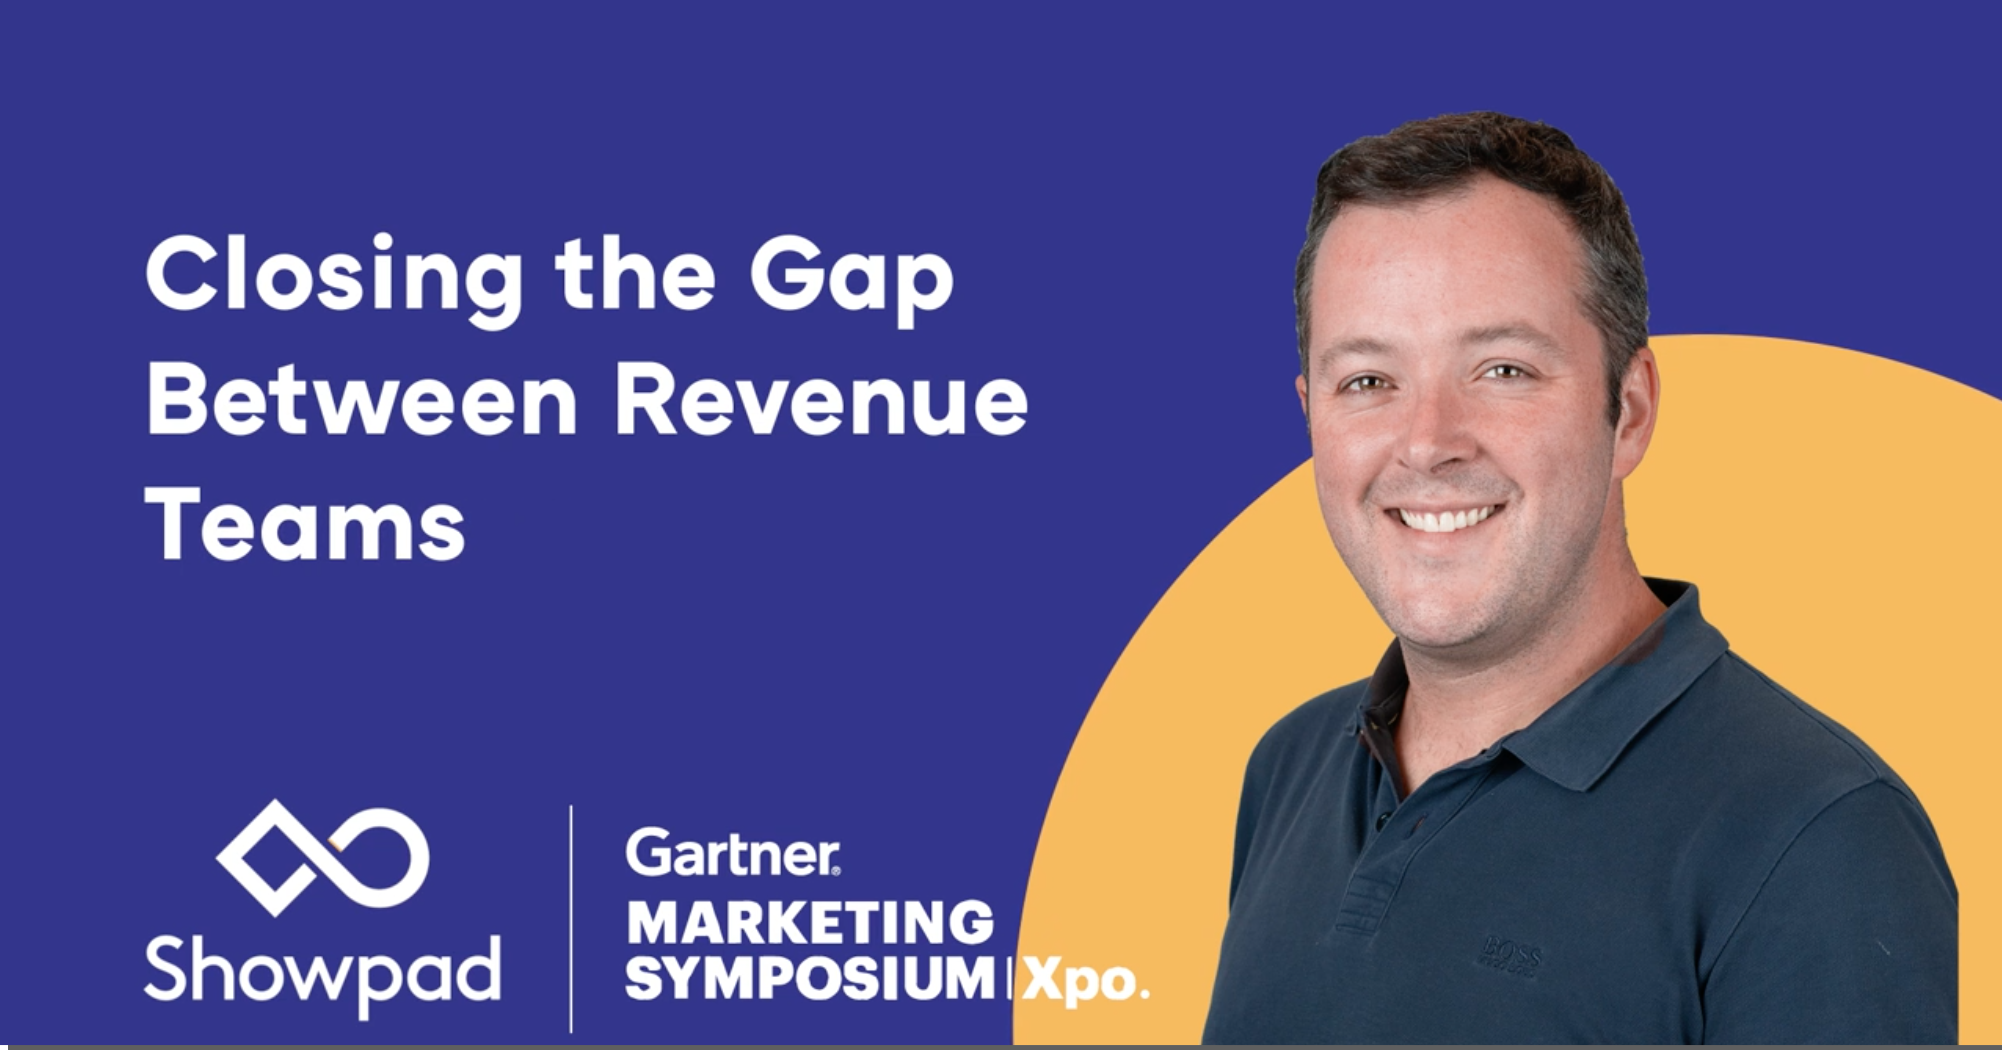 Gartner Marketing Symposium